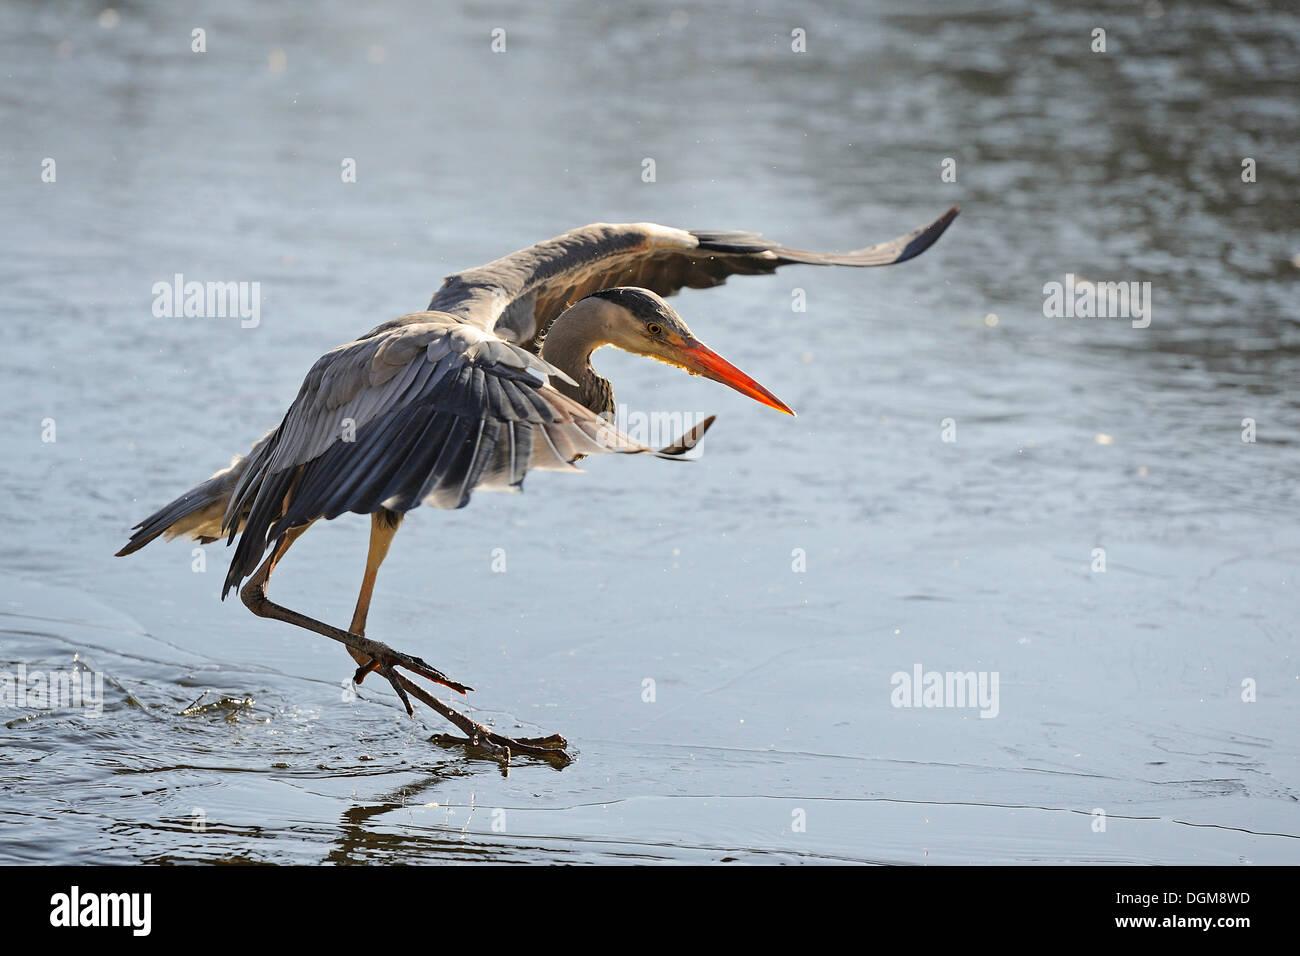 Grey Heron (Ardea cinerea) landing on the thin ice of a lake - Stock Image